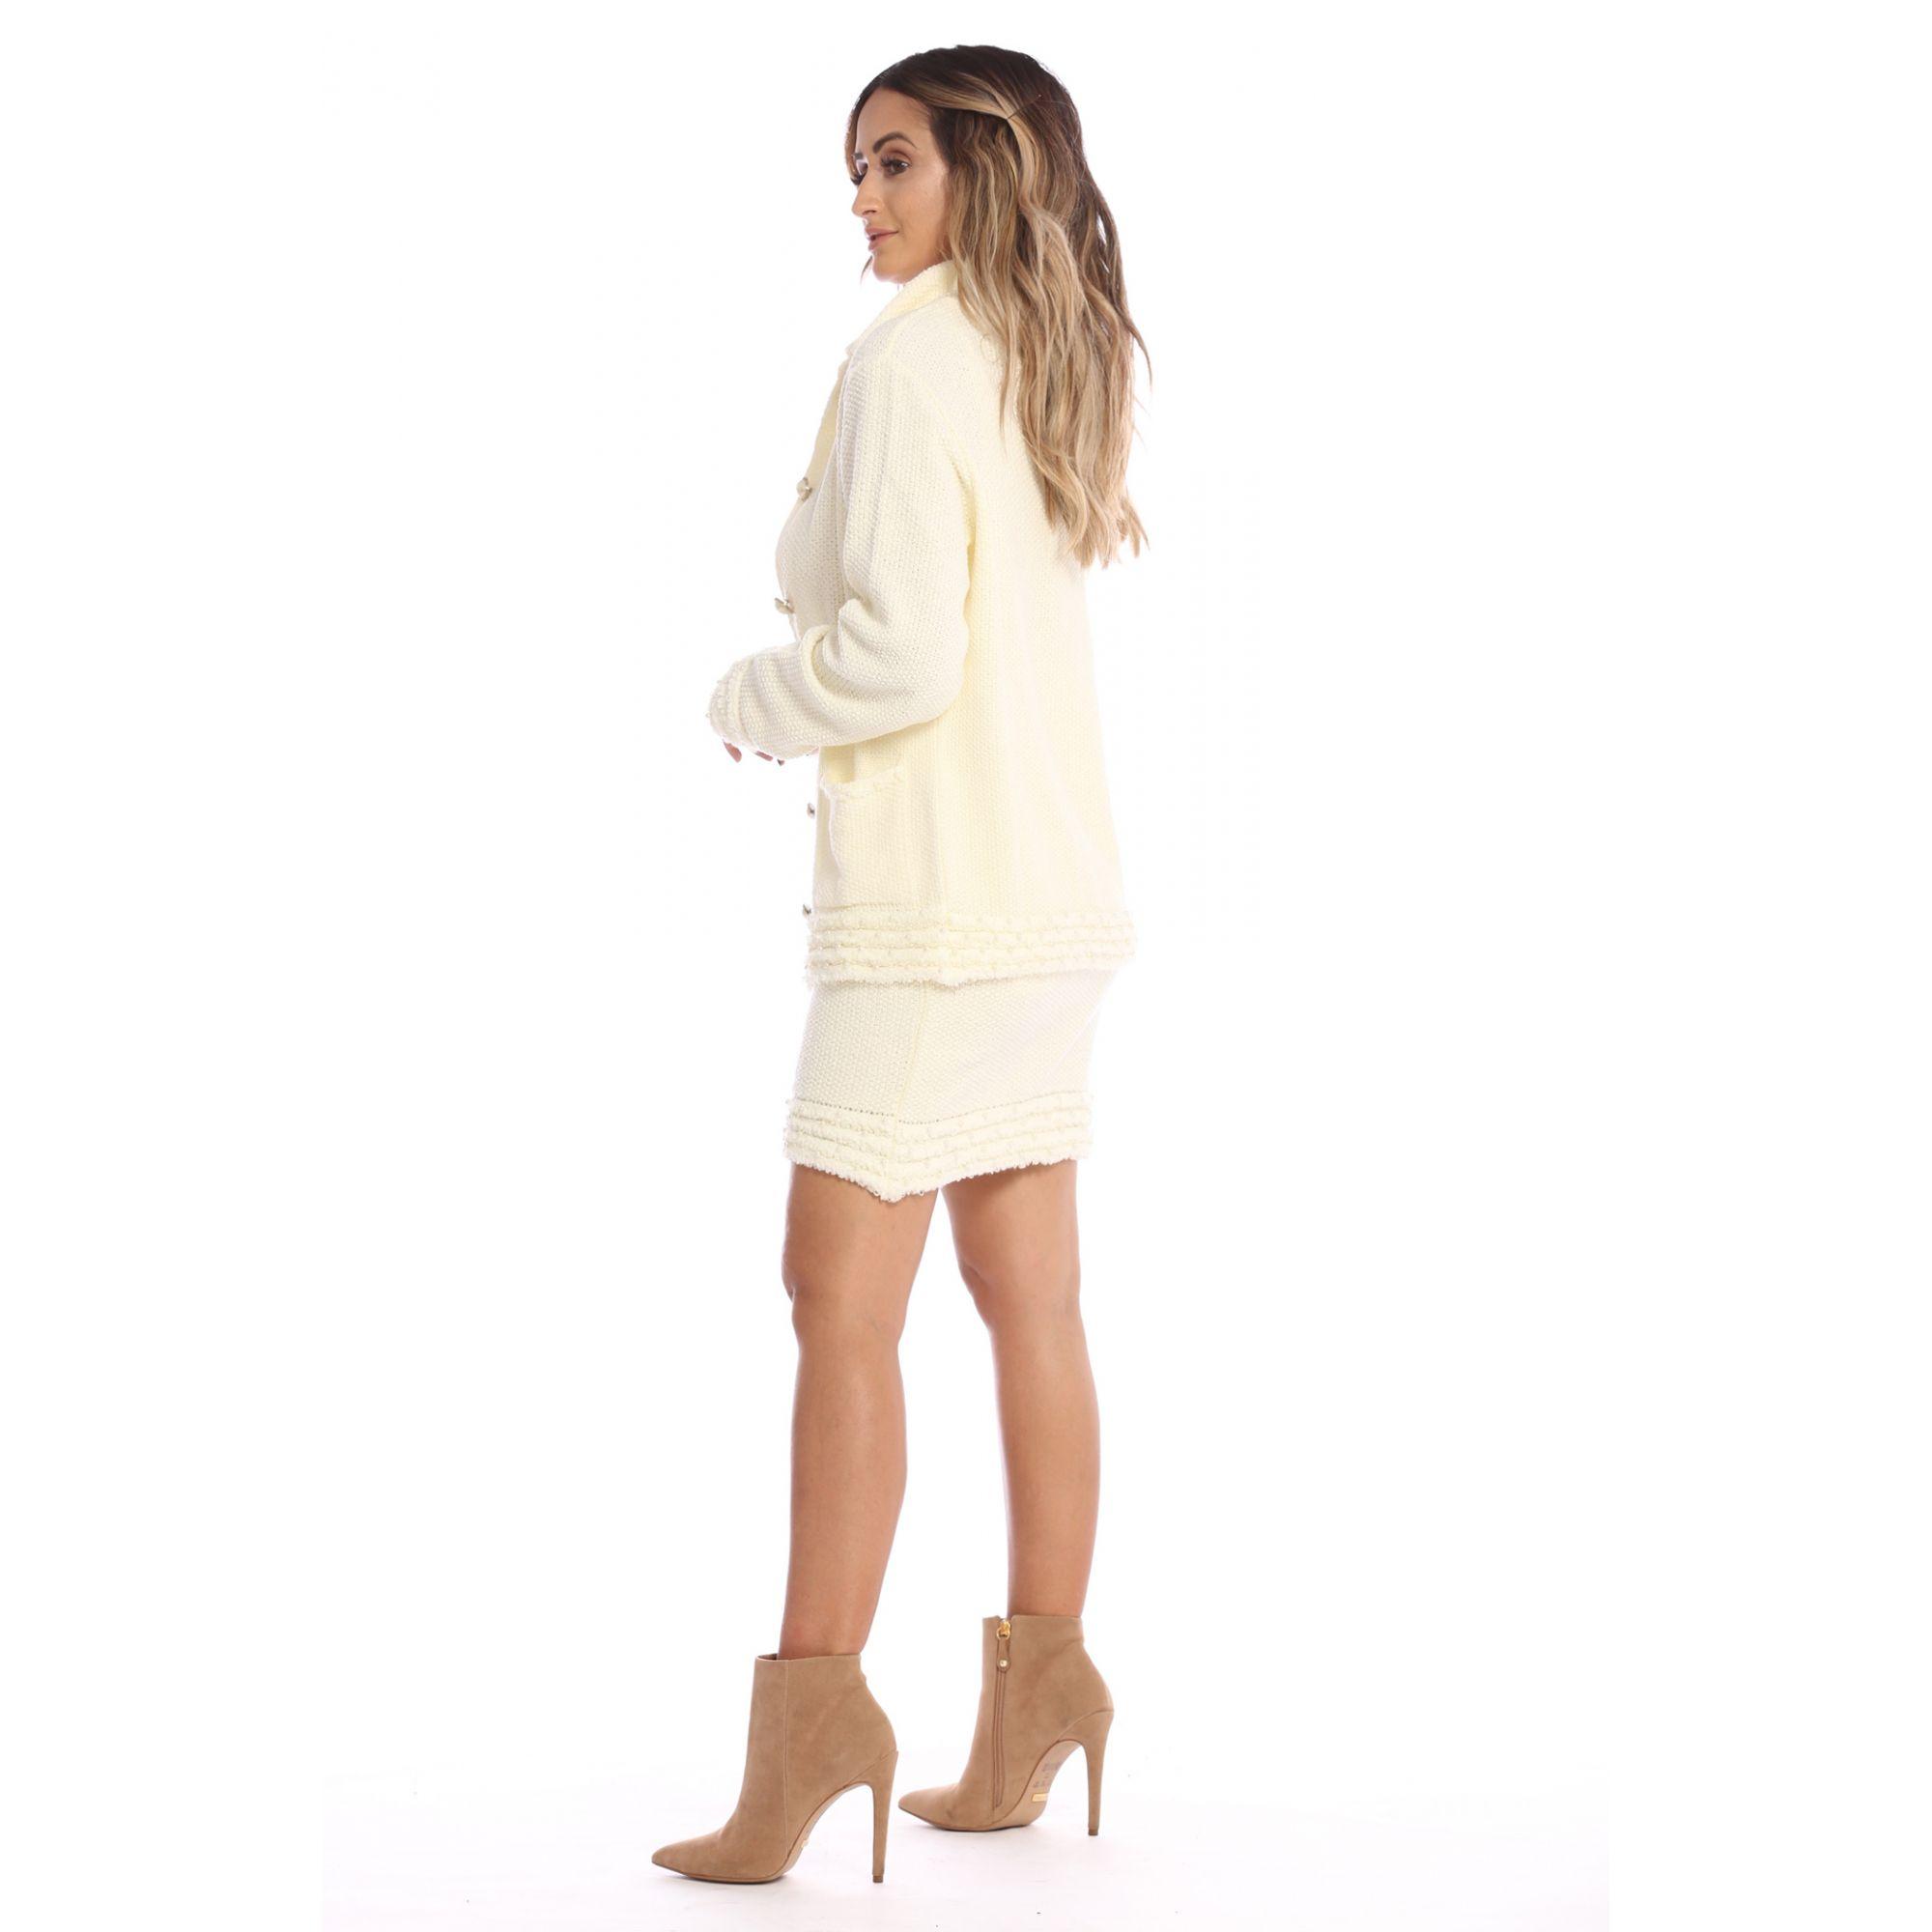 Saia Curta Vera Tricot Pérola Feminino Off White